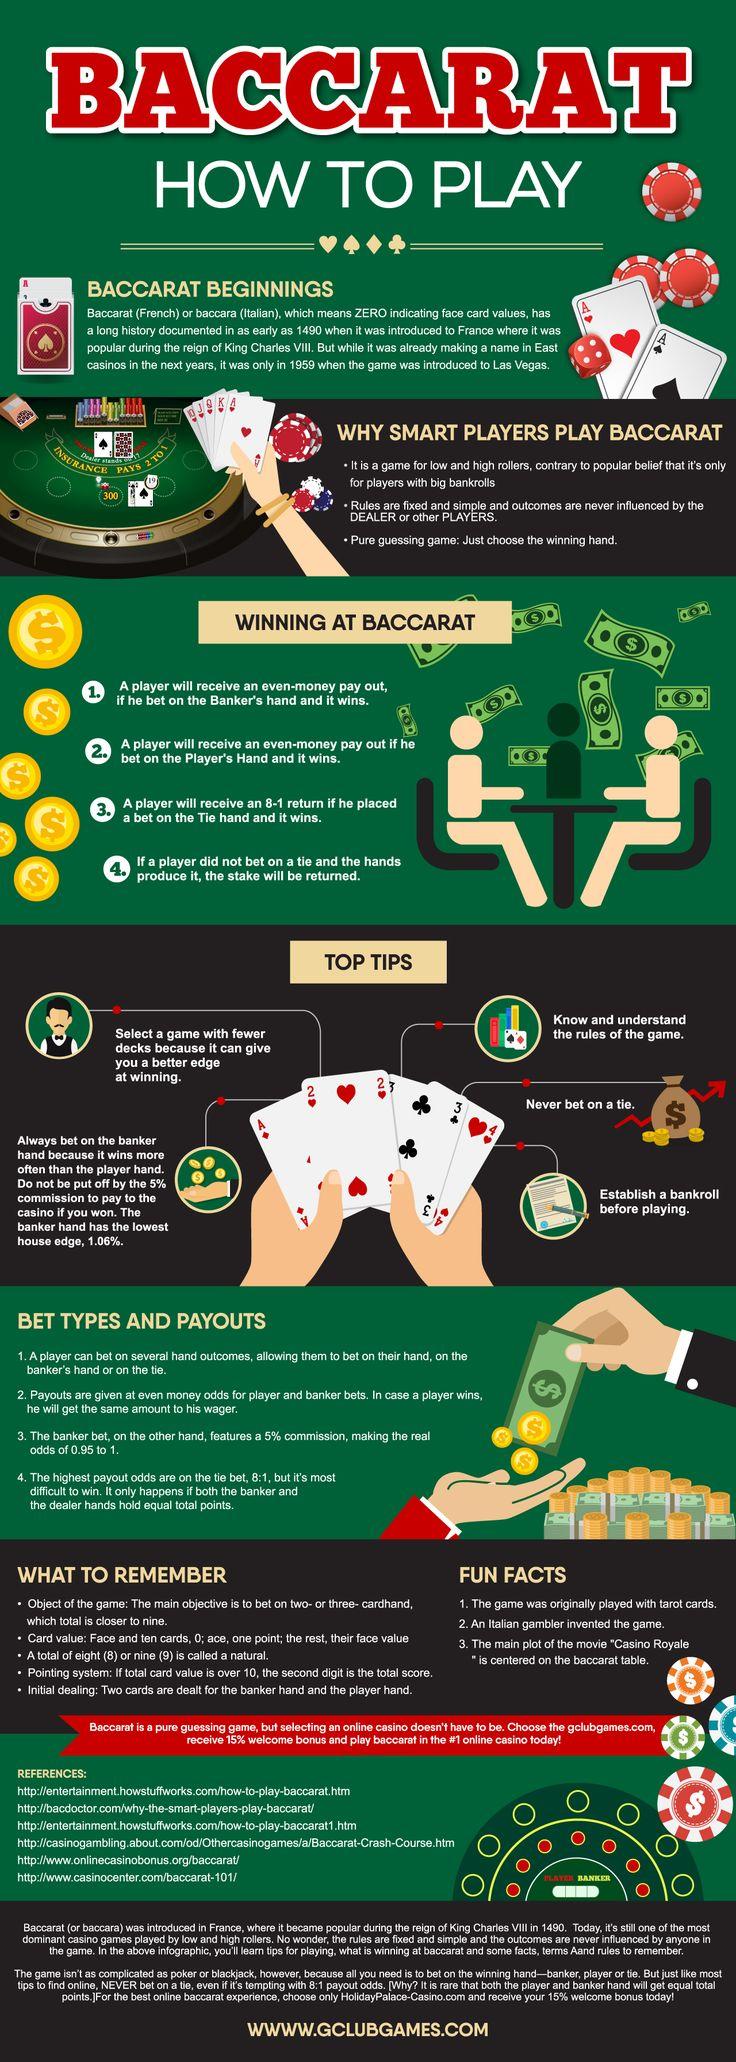 Online casino directory online casino portal online casino g gambling casino tunica